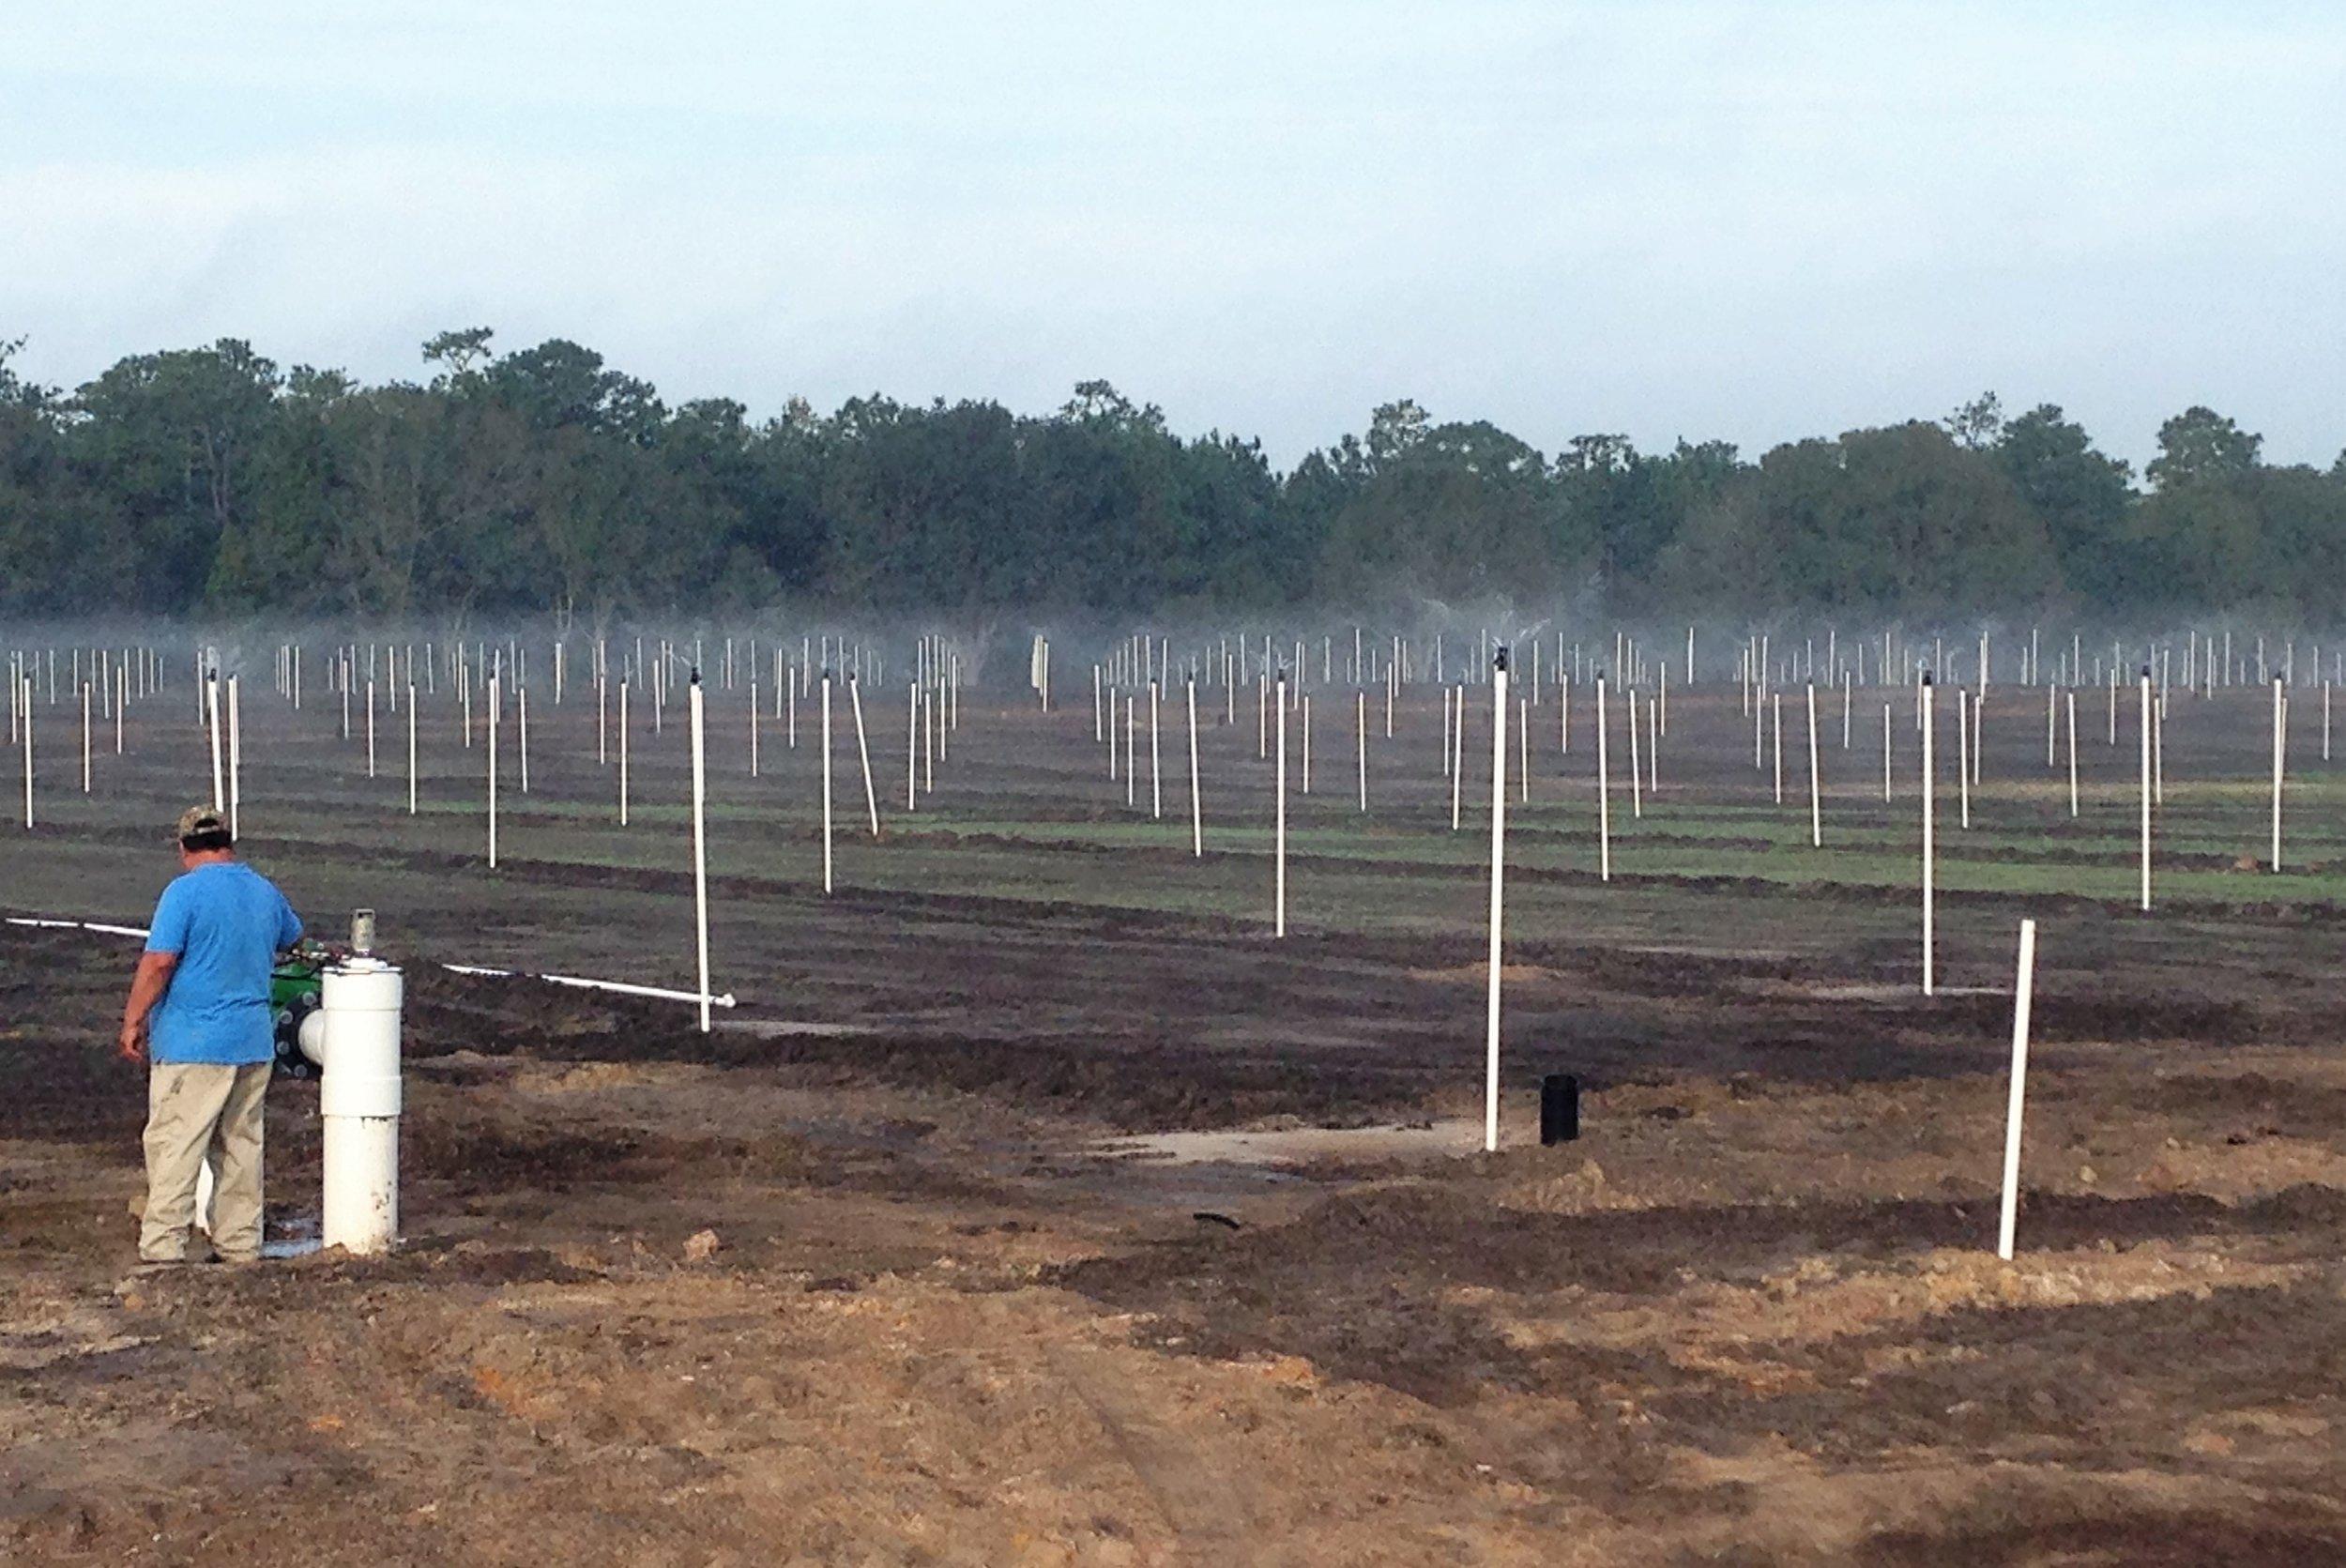 Pressure testing the sprinklers in a new field before planting.